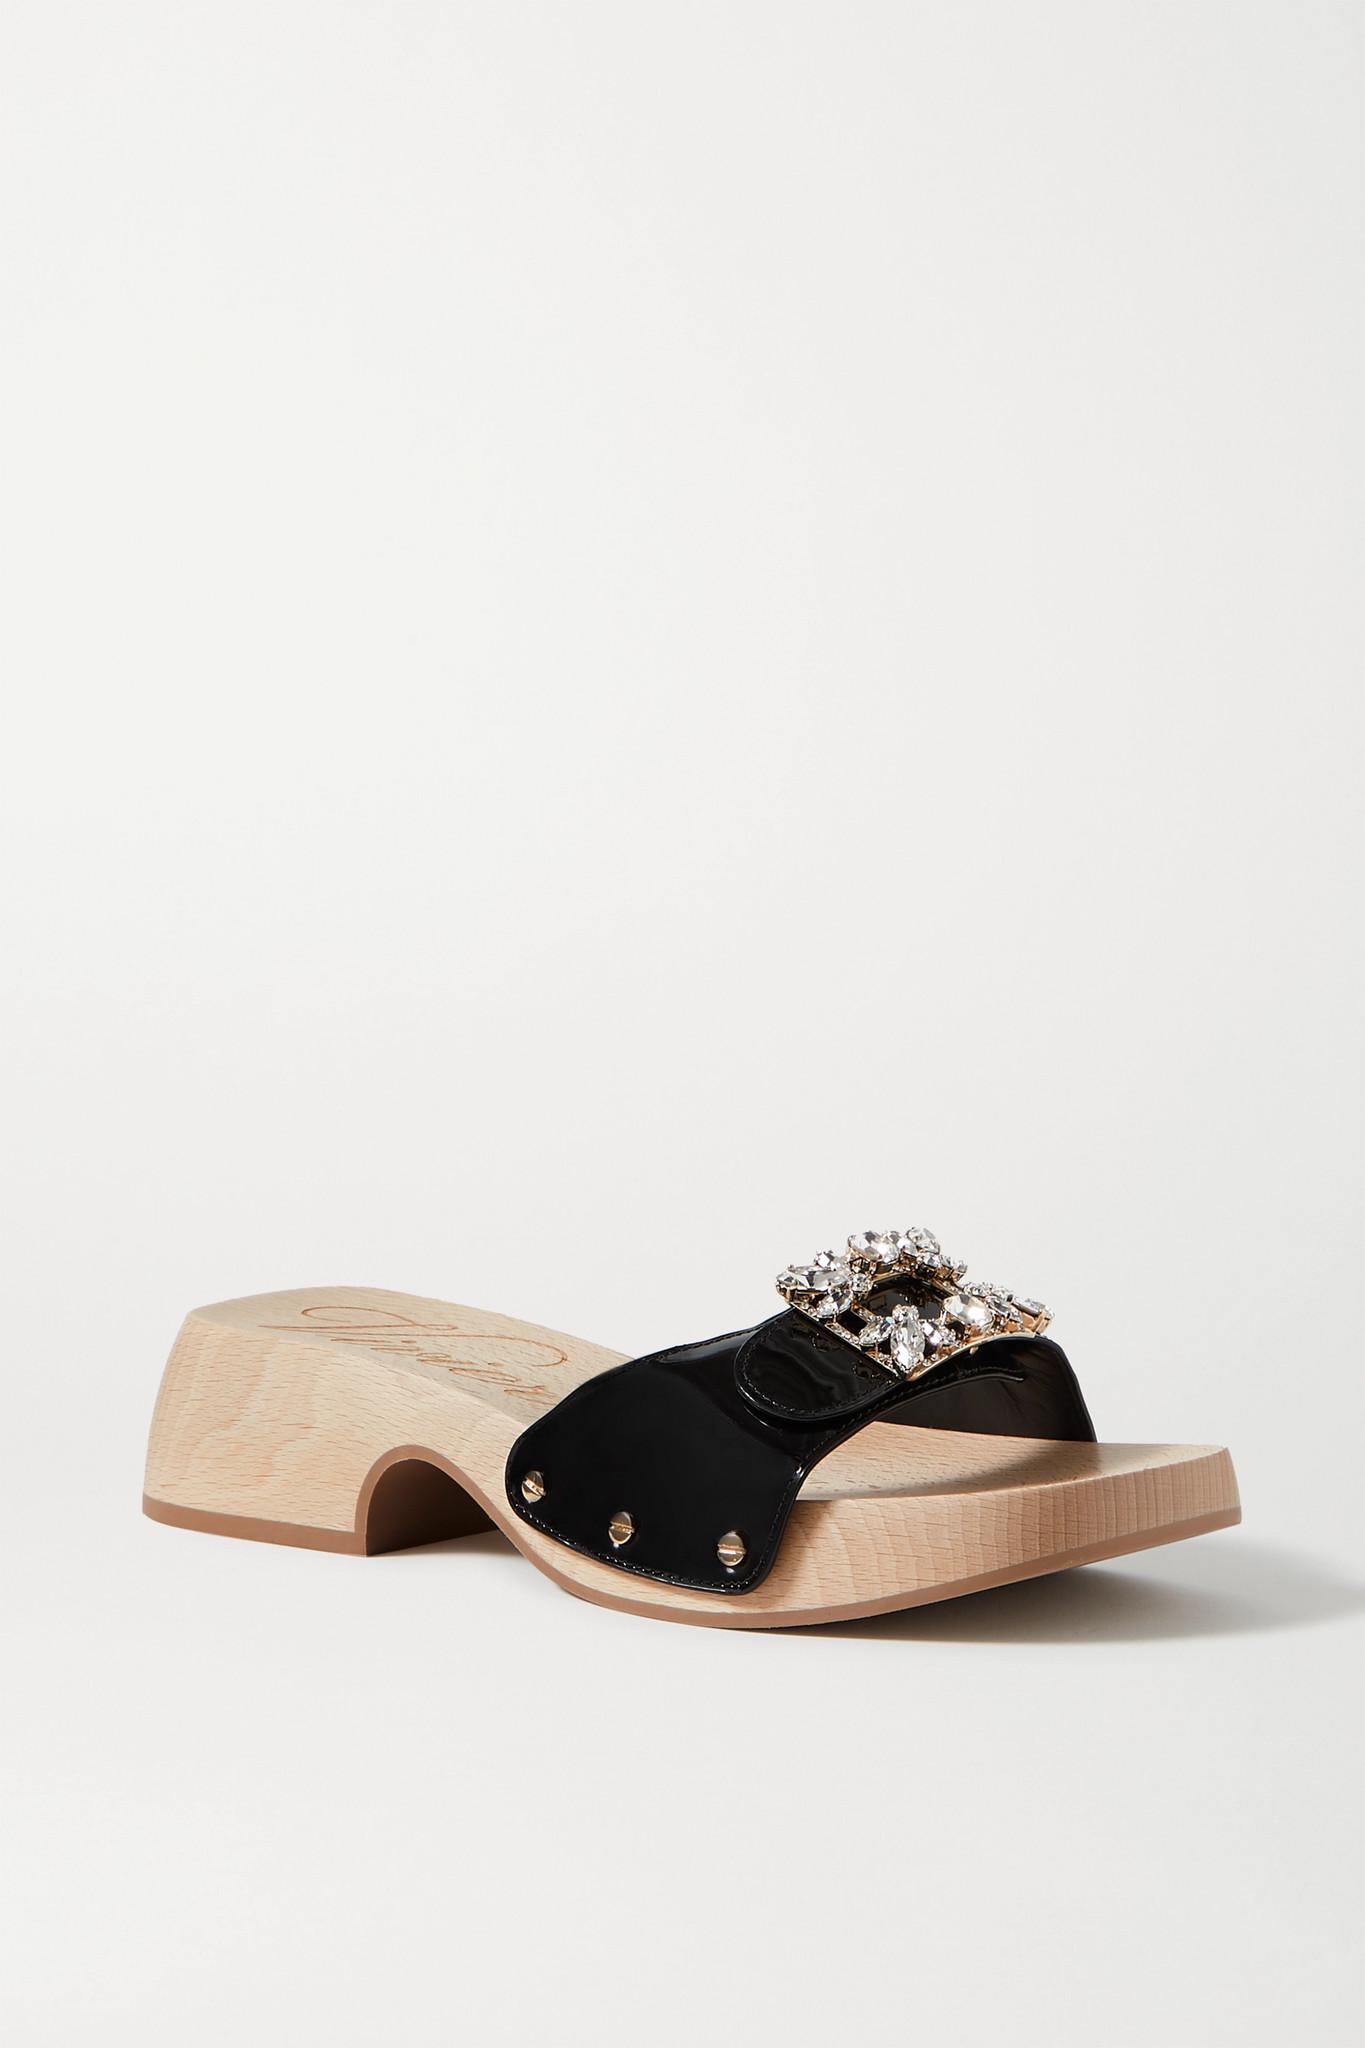 ROGER VIVIER - Viv 水晶缀饰漆皮穆勒鞋 - 黑色 - IT40